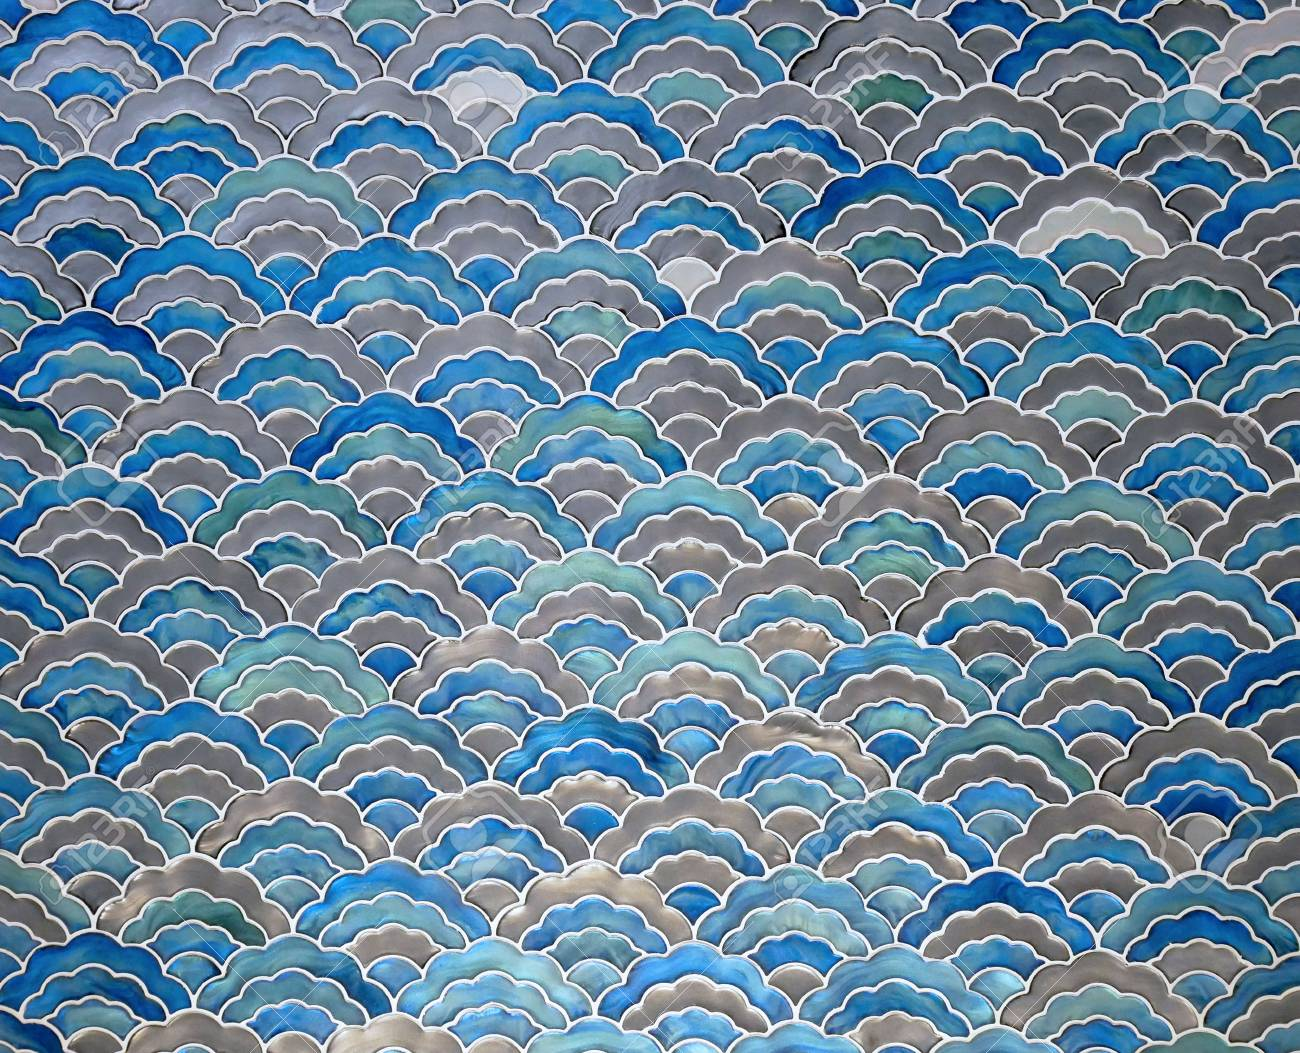 blue ceramic tile mosaic seamless wave pattern texture background